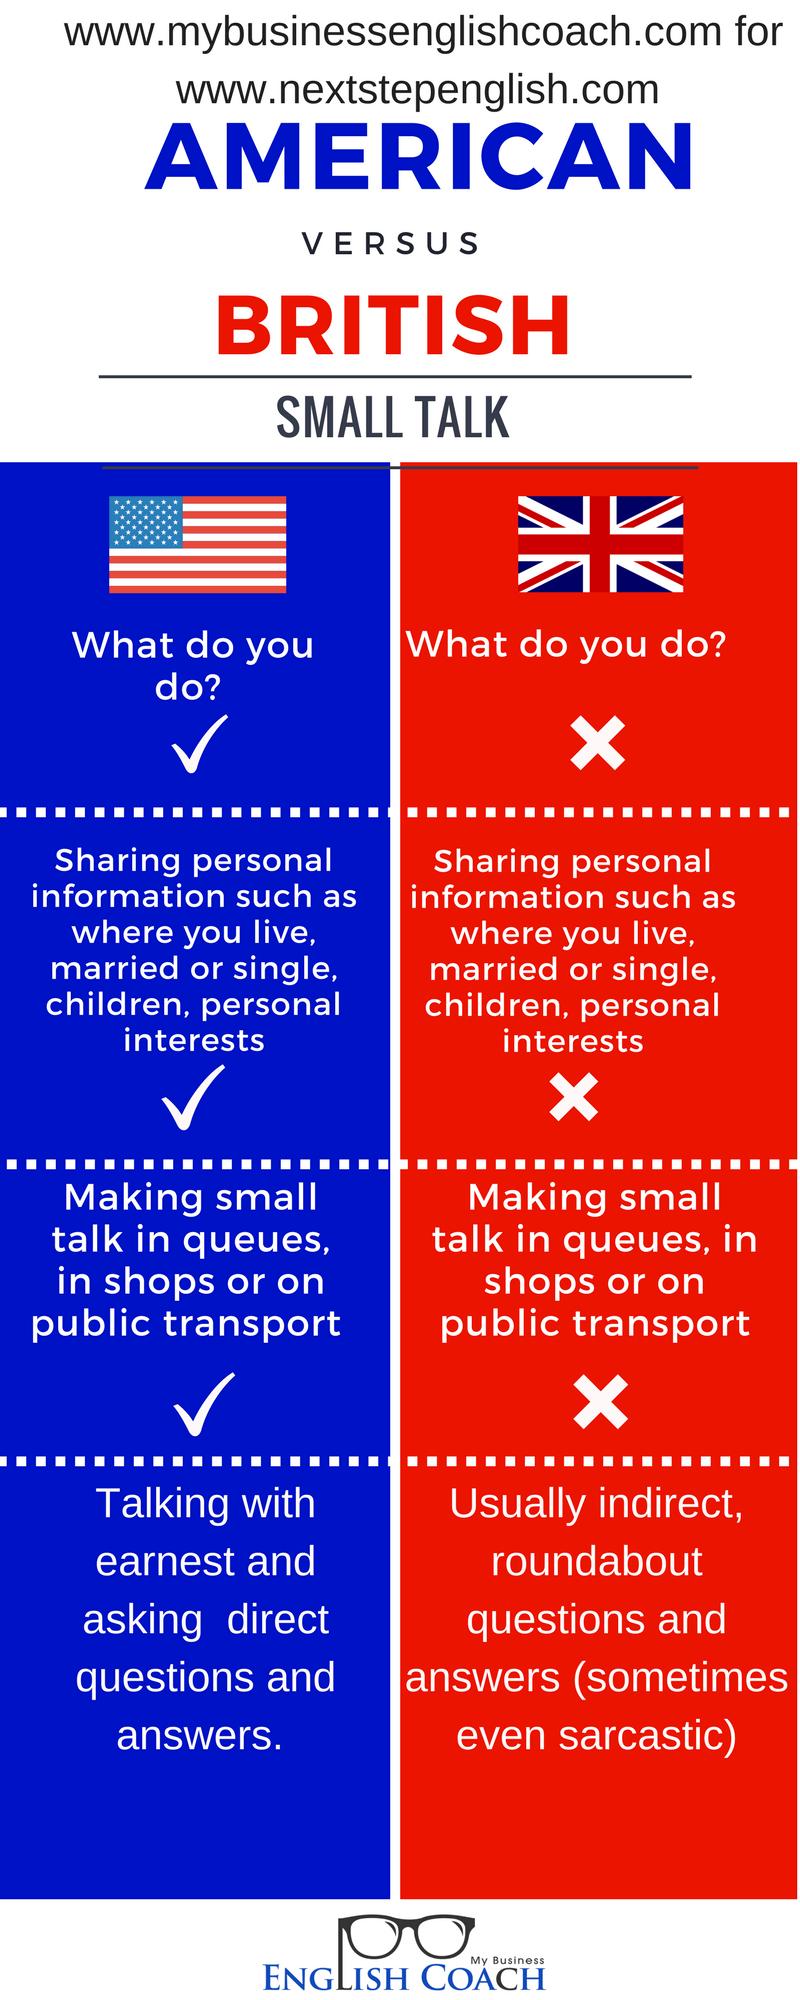 English-Small-Talk-American-vs-British-2